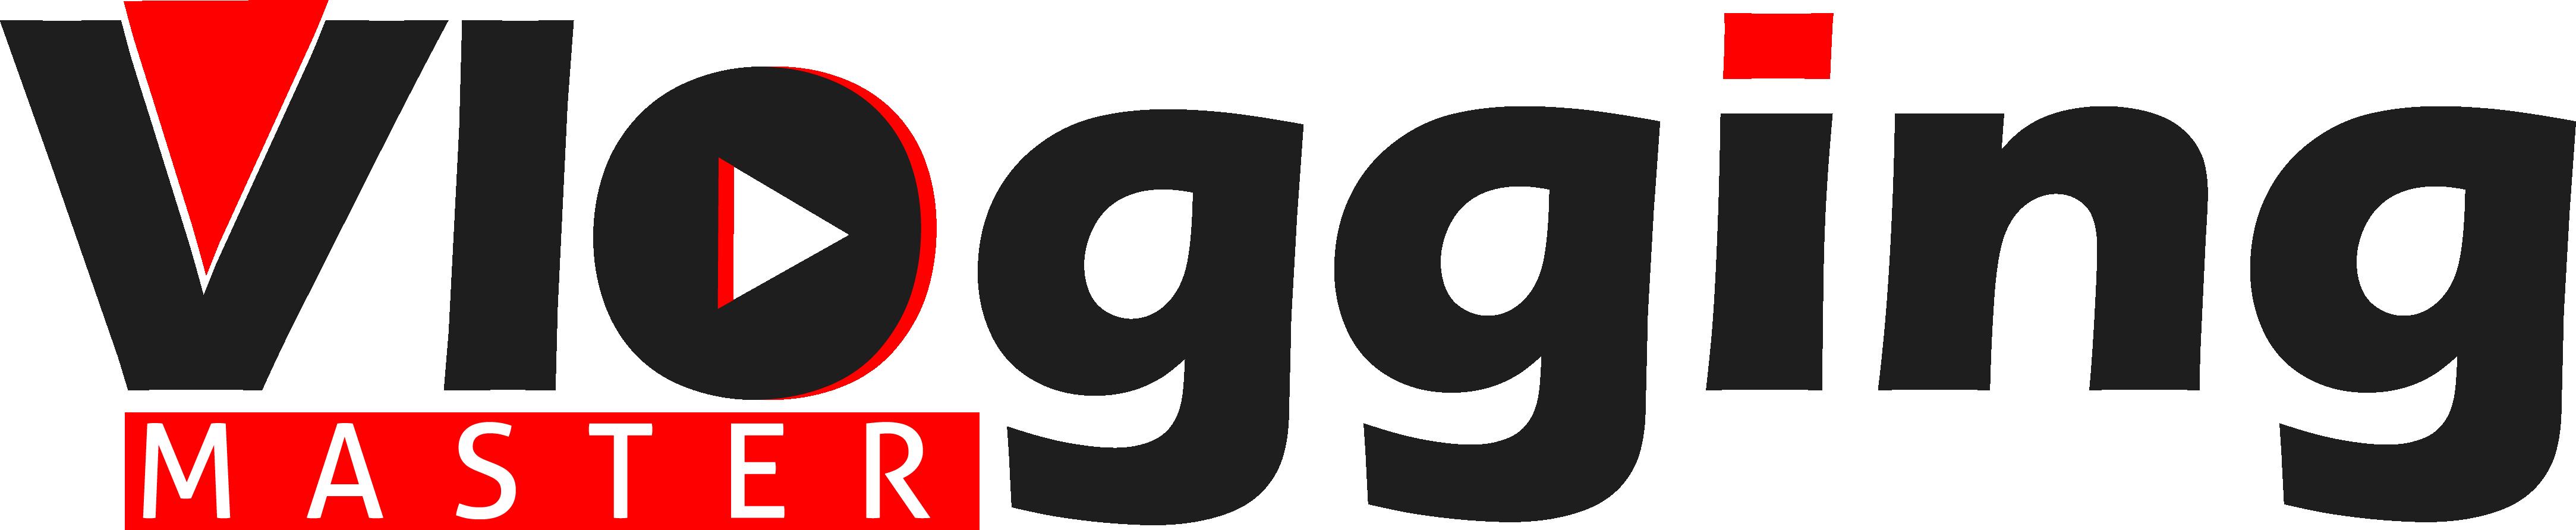 VloggingMaster